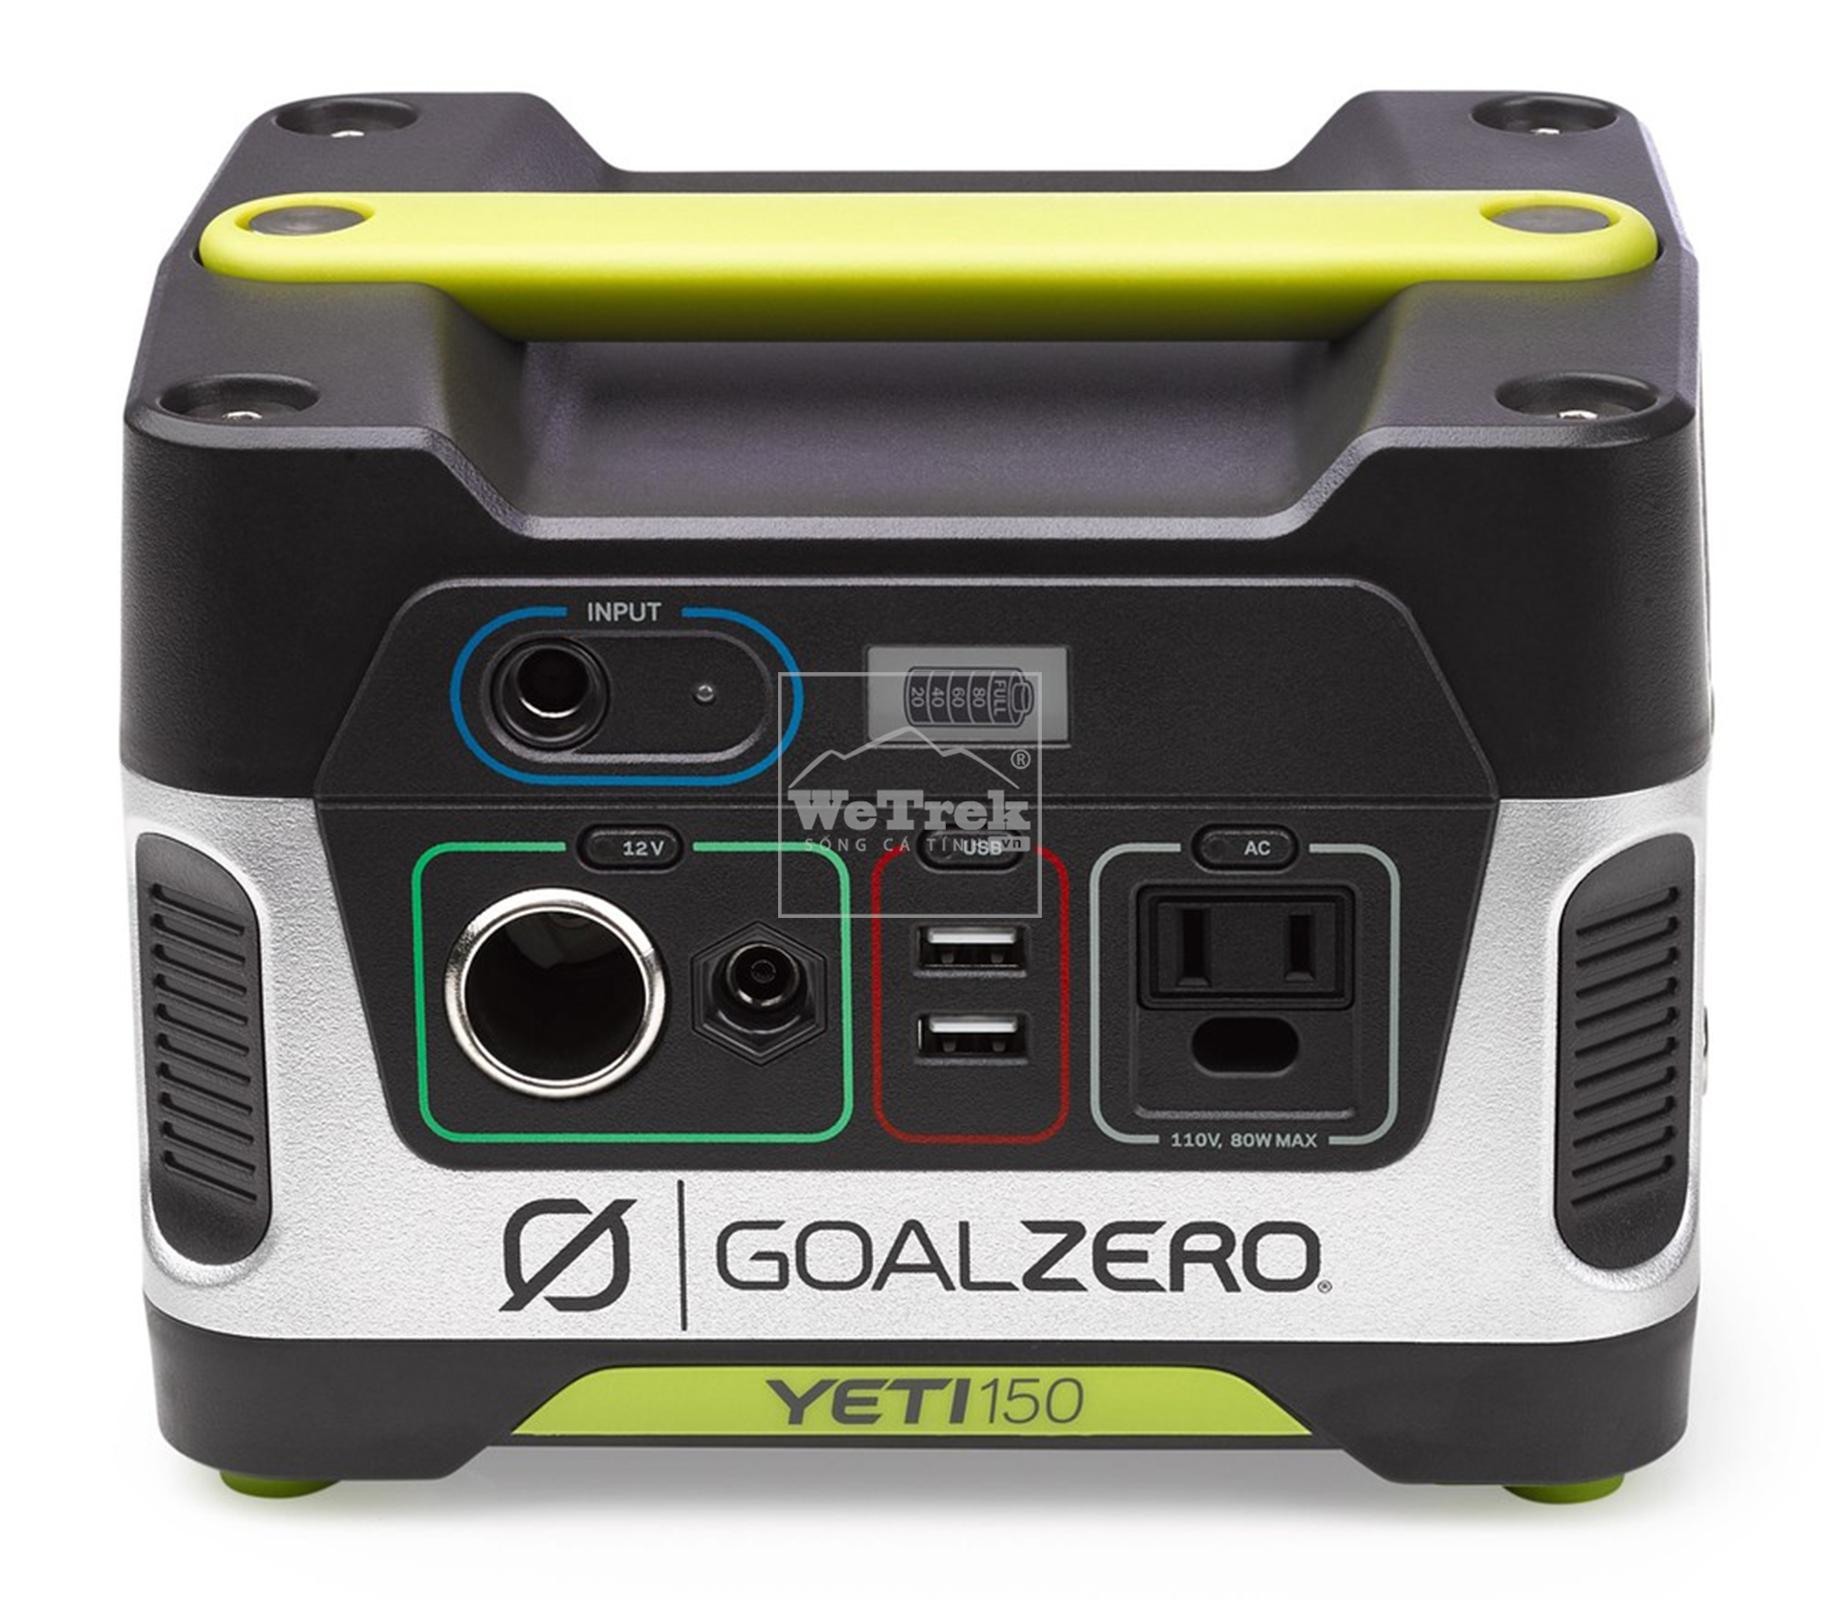 Tram-phat-dien-xach-tay-Goal-Zero-Yeti-150-Portable-Power-Station-61208-wetrekvn-3.jpg